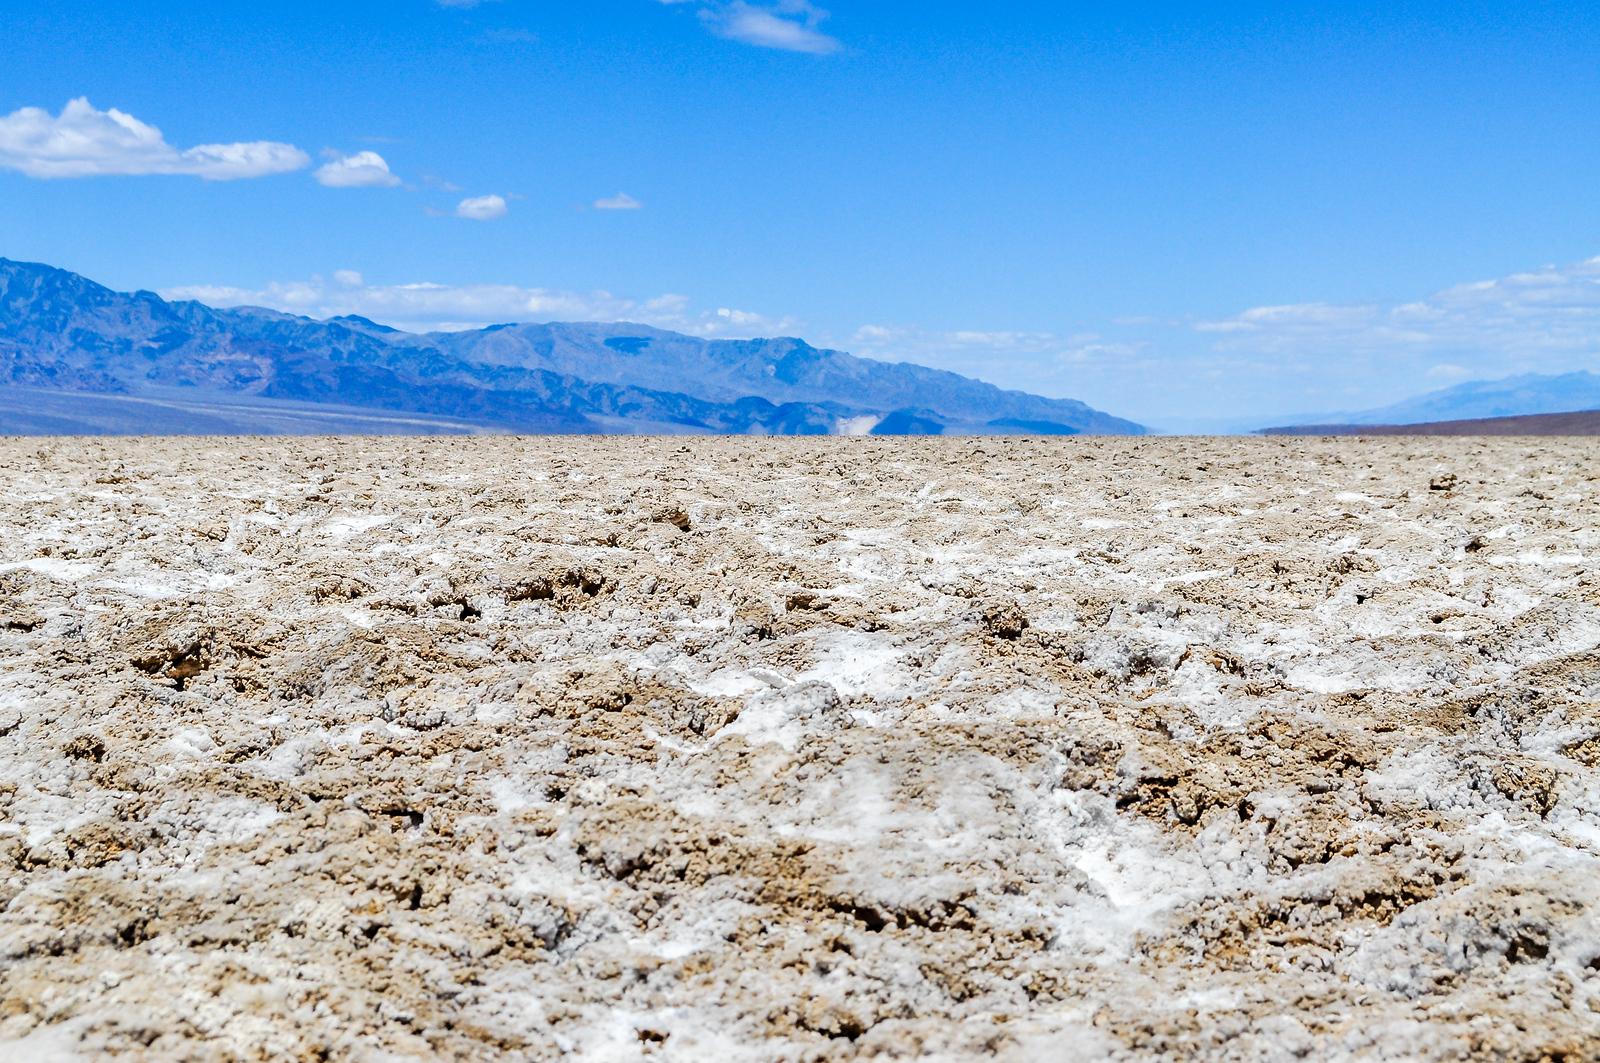 Dust Devil in the Badwater Basin